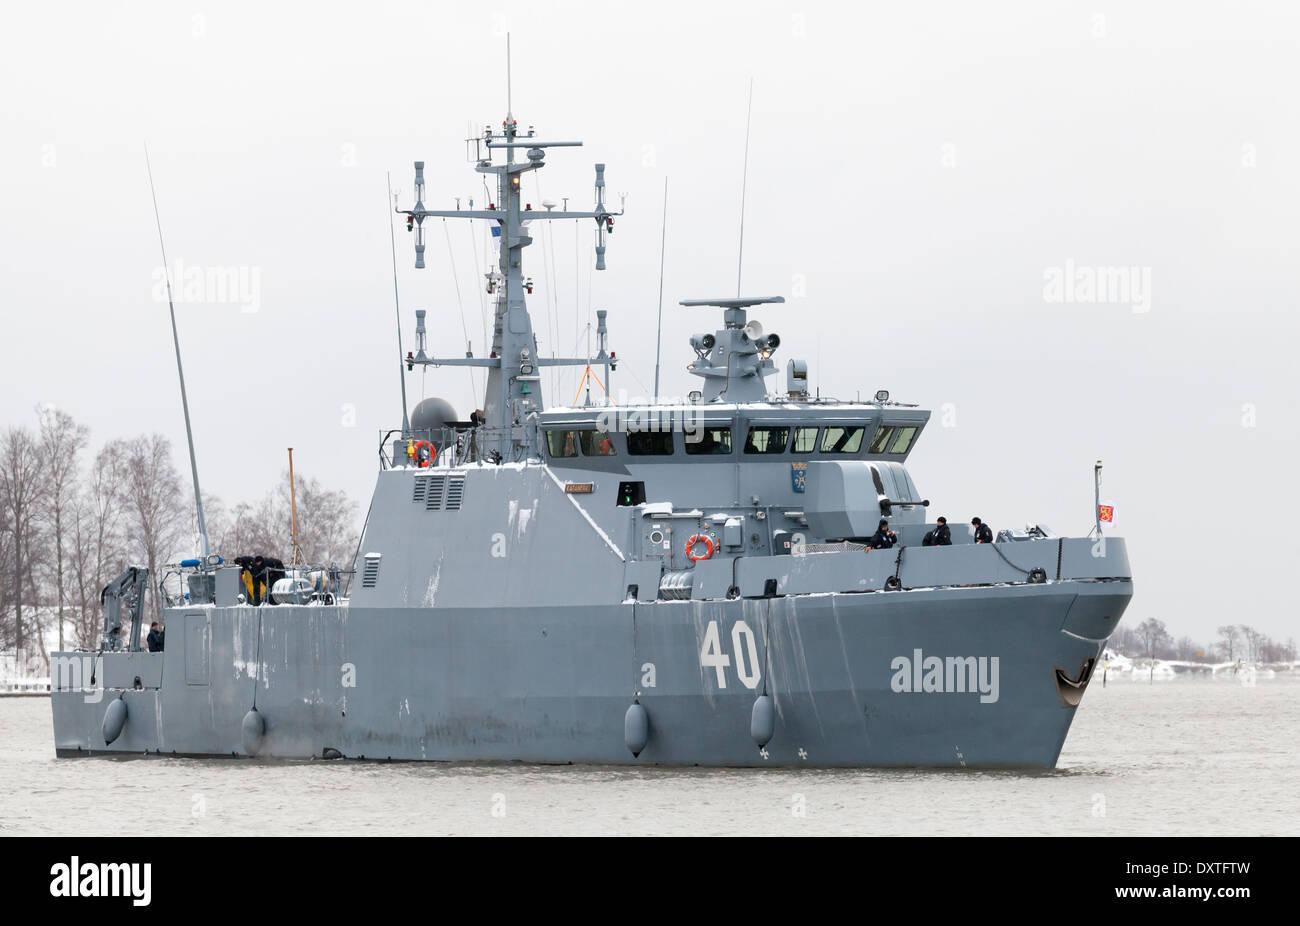 HELSINKI, FINLAND - DECEMBER 2012: Katanpaa class mine countermeasure vessel enters the port of Helsinki - Stock Image